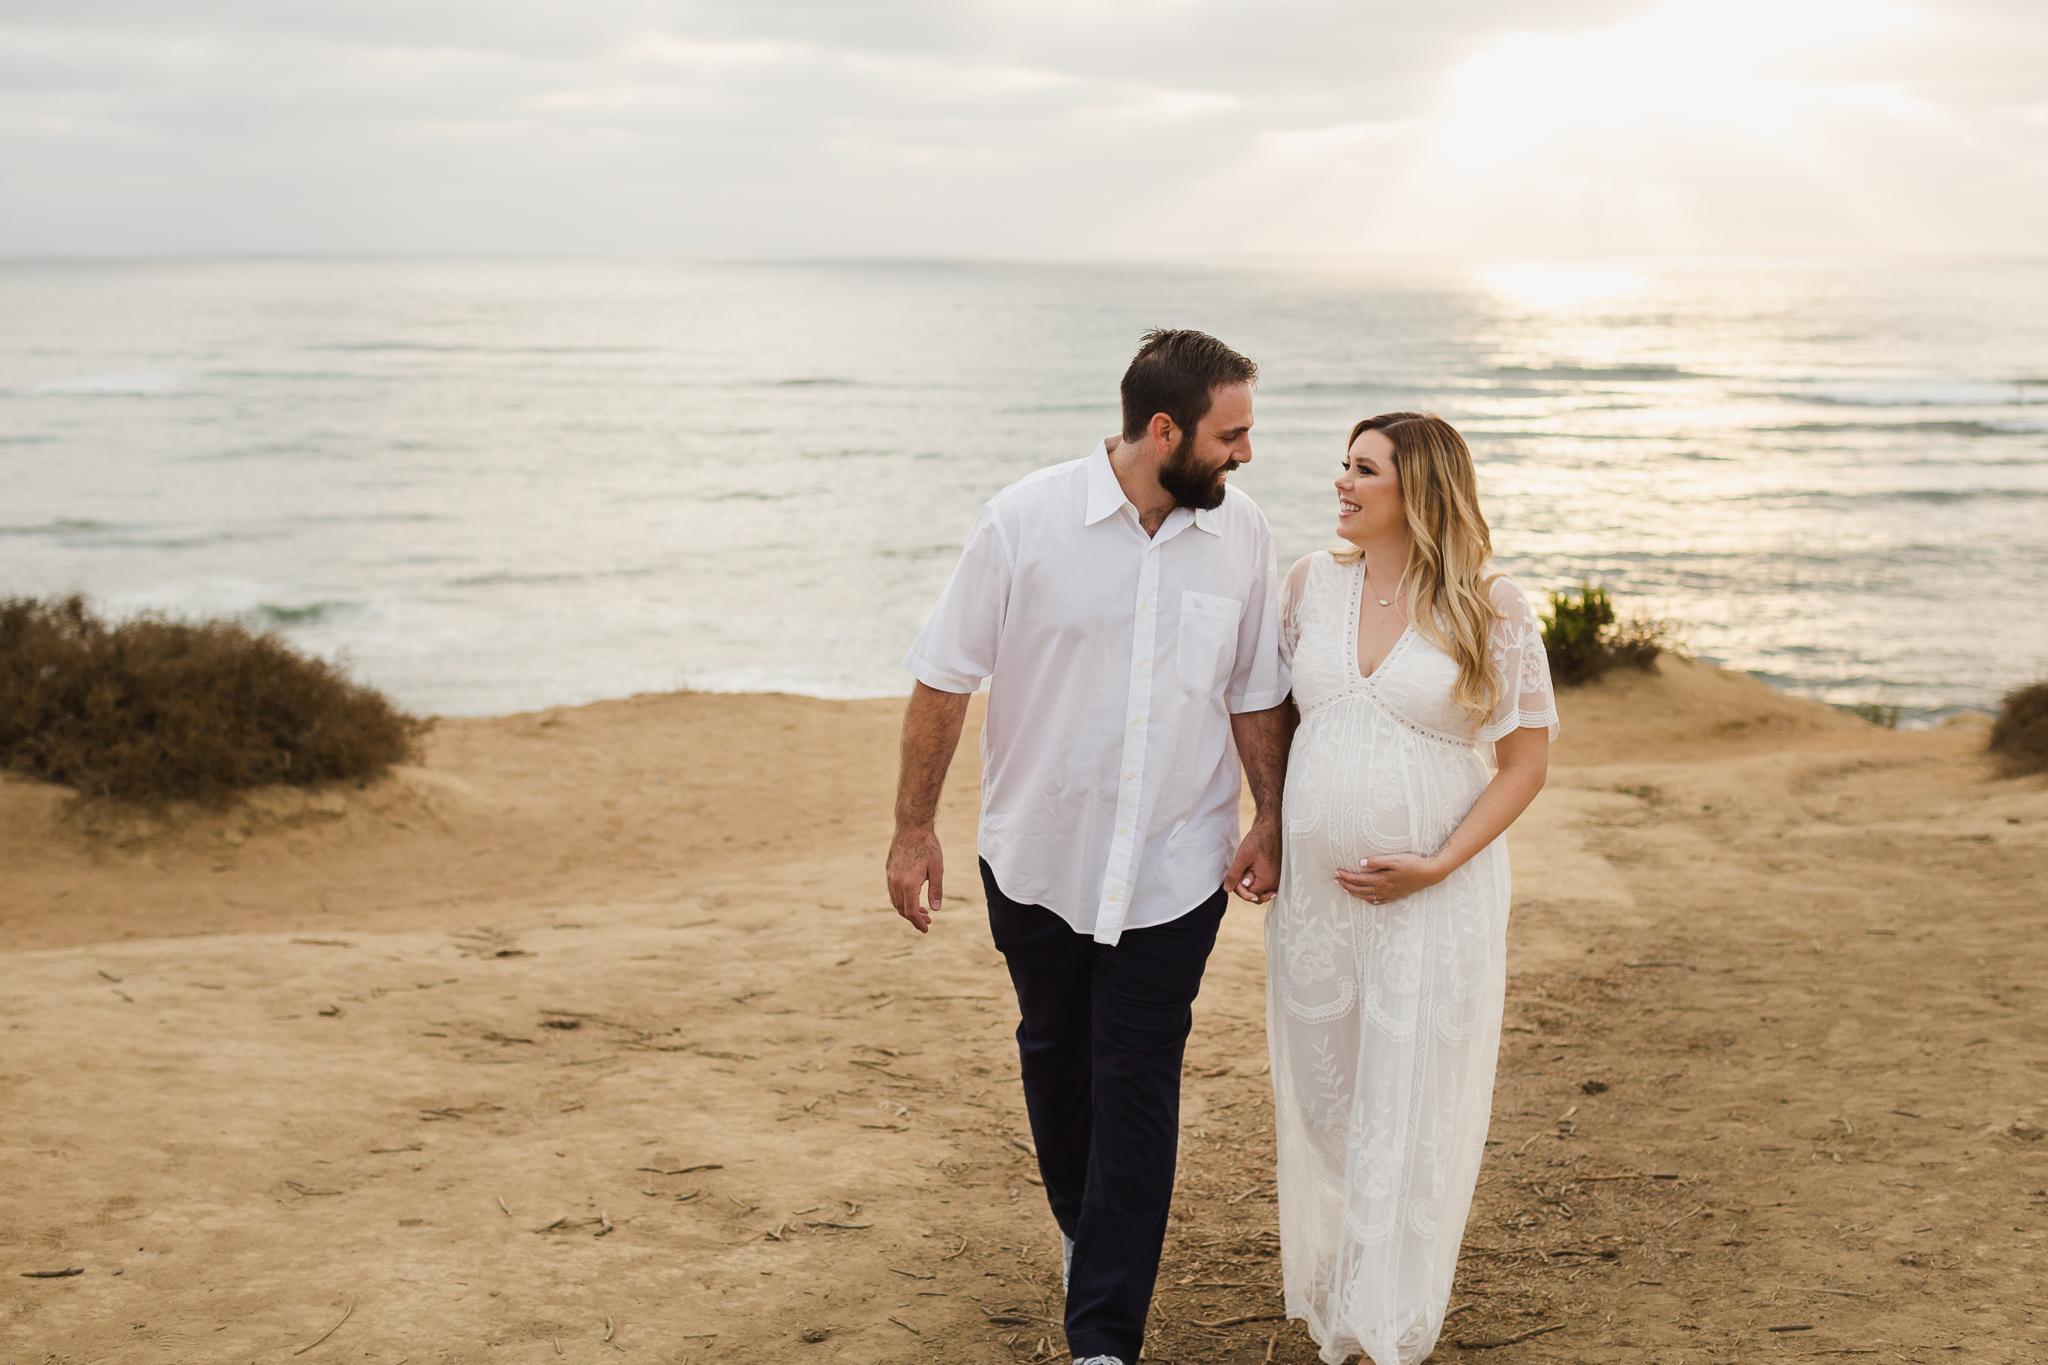 San-Diego-Photographer-Christine-Dammann-Maternity-Sunset-Cliffs-8.jpg